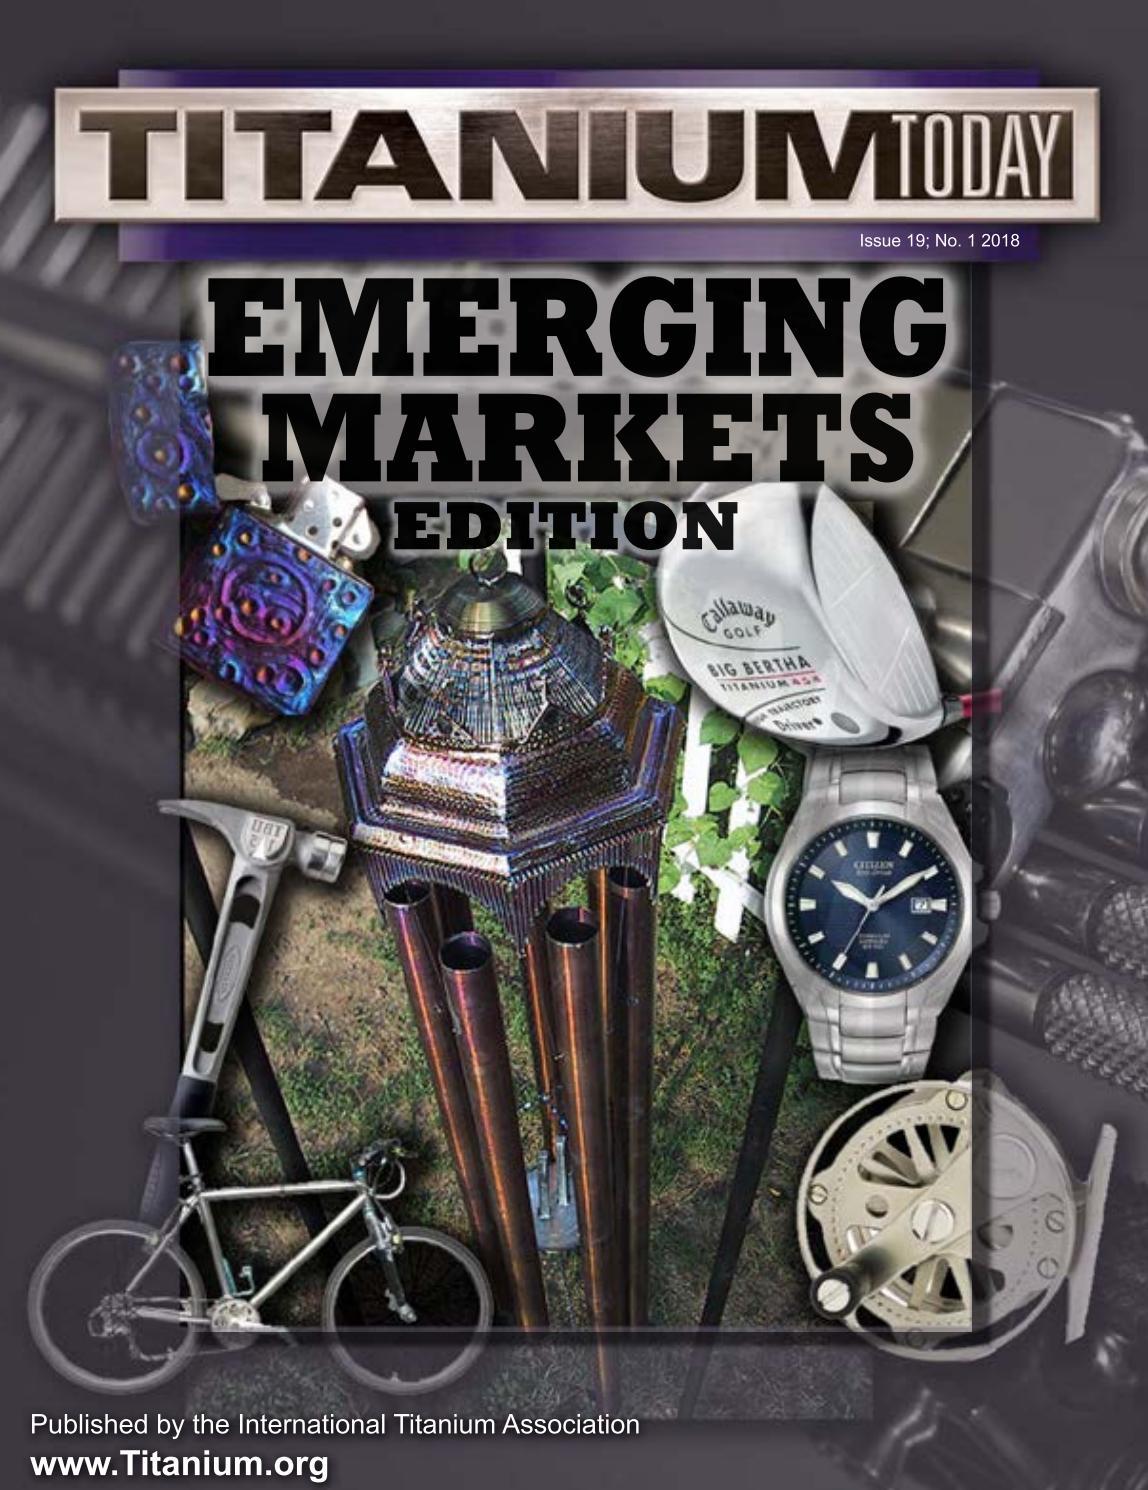 TITANIUM Today - Emerging Markets by TITANIUMTODAY - issuu